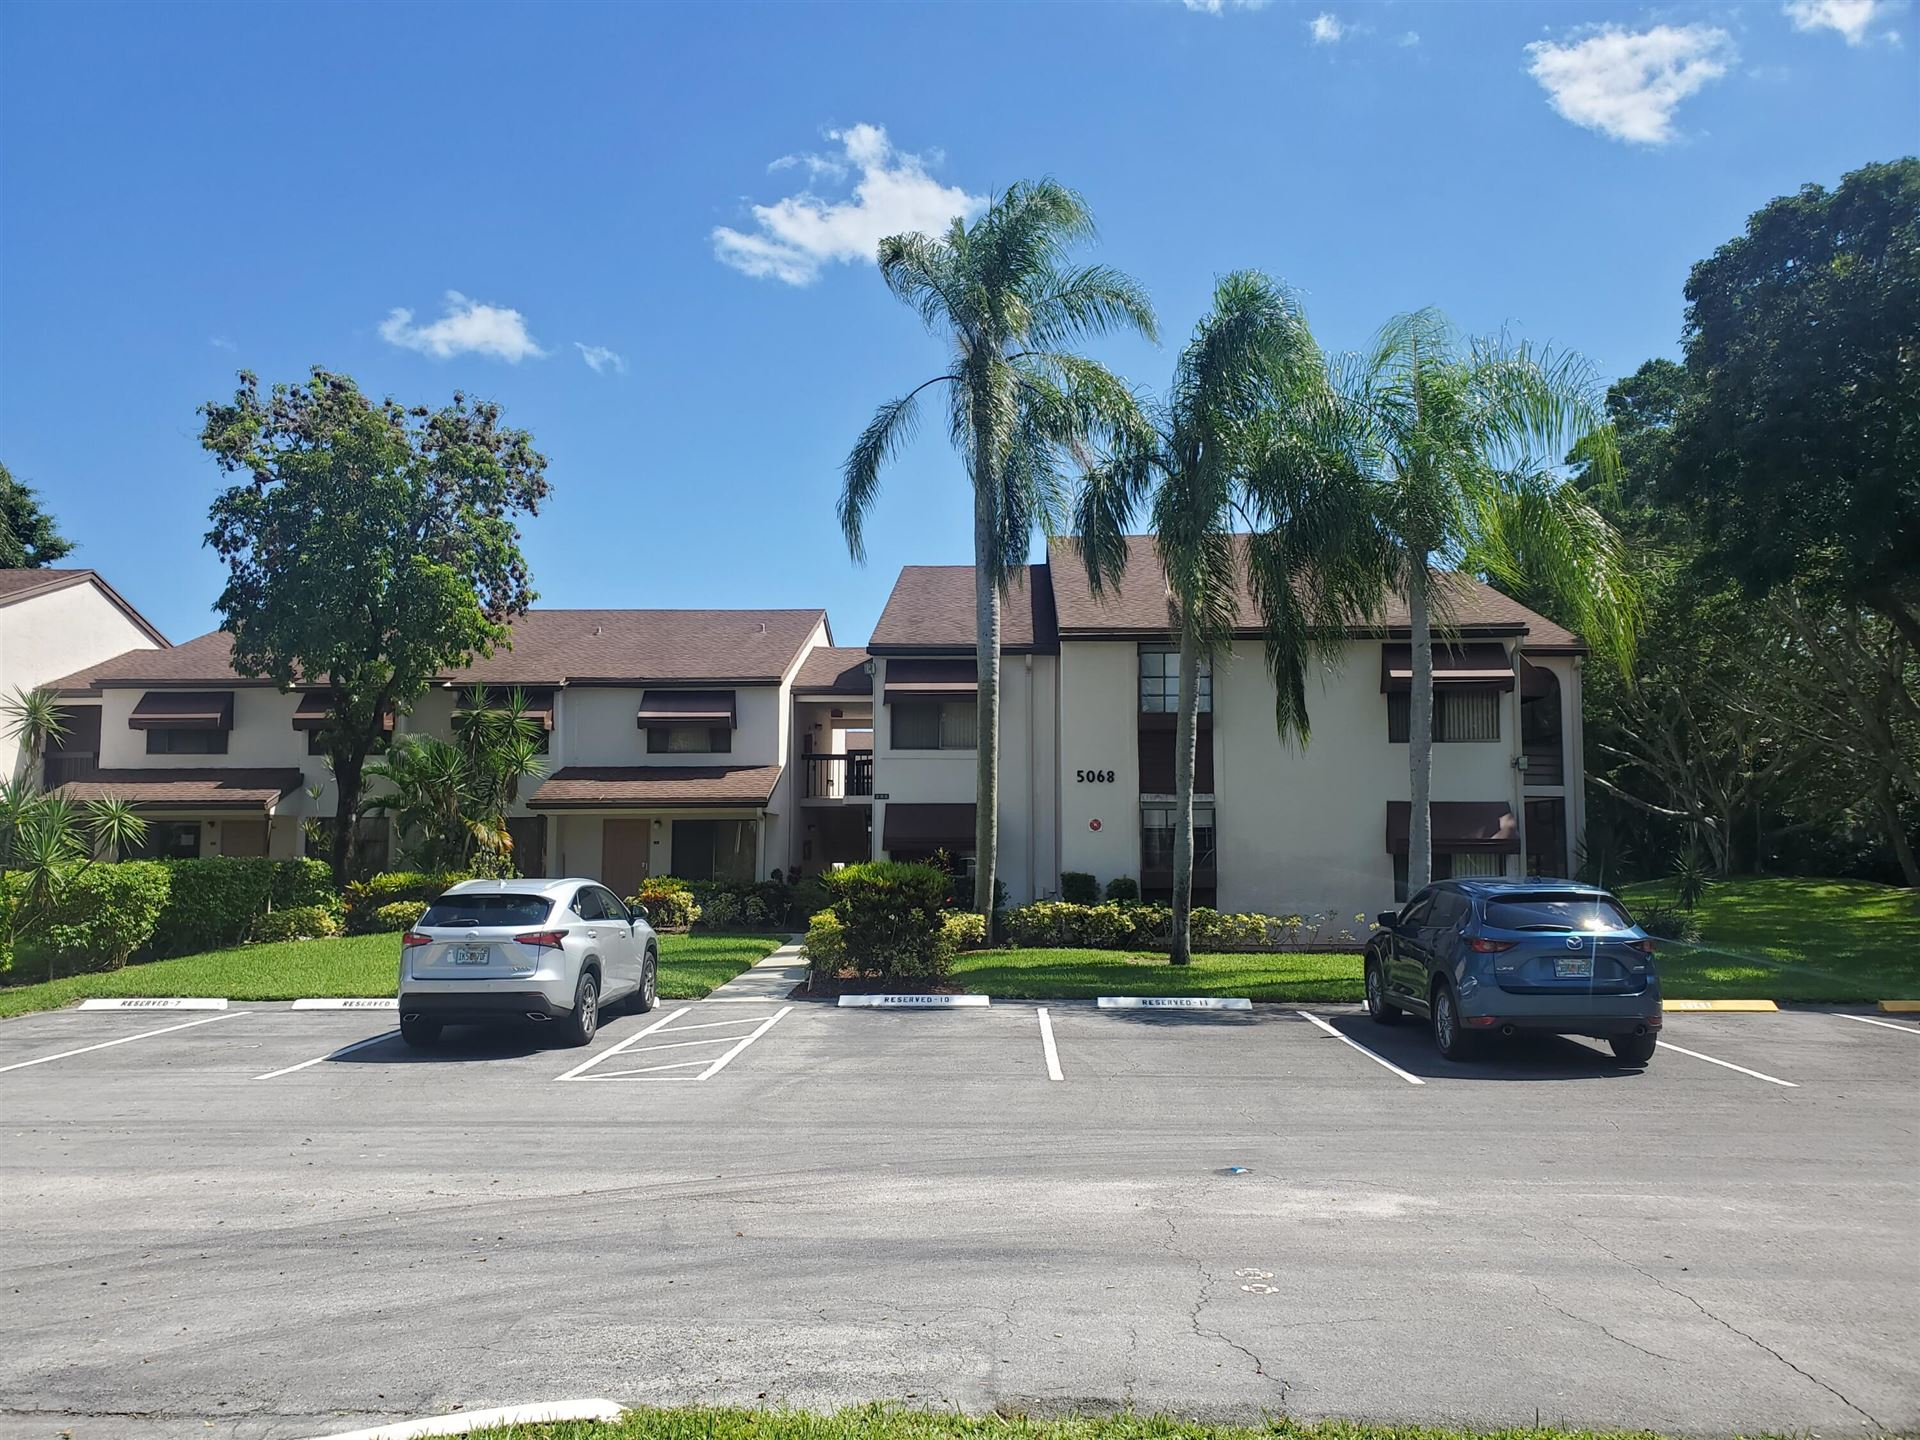 5068 Rose Hill Dr. Drive #105, Boynton Beach, FL 33437 - MLS#: RX-10748443